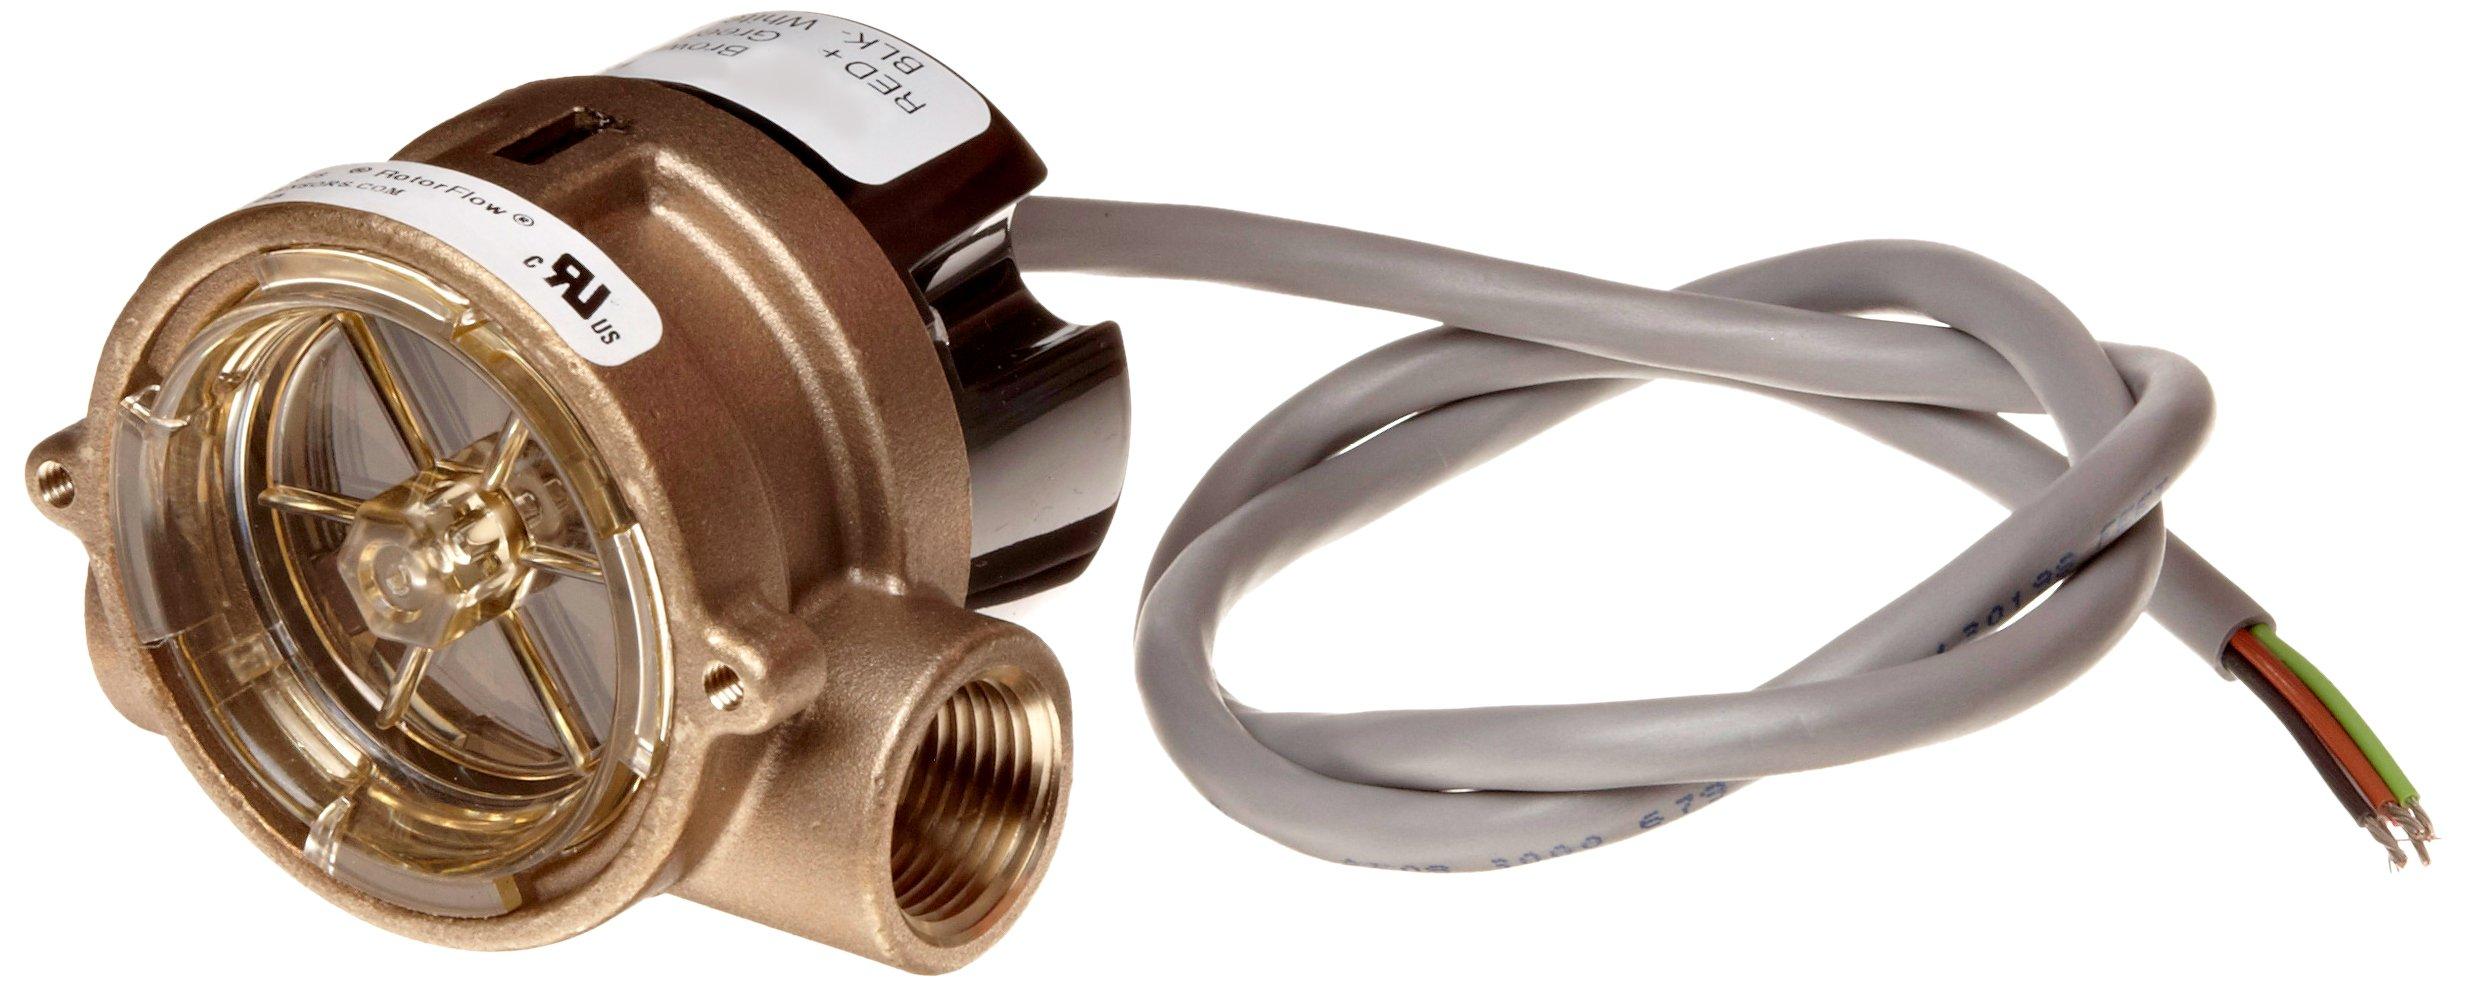 Gems Sensors RFS Series Brass Flow Sensor Switch, Inline, Rotor Type, 24 VDC Input, 1.5 - 20.0 gpm Flow Setting Adjustment Range, 1/2'' NPT Female